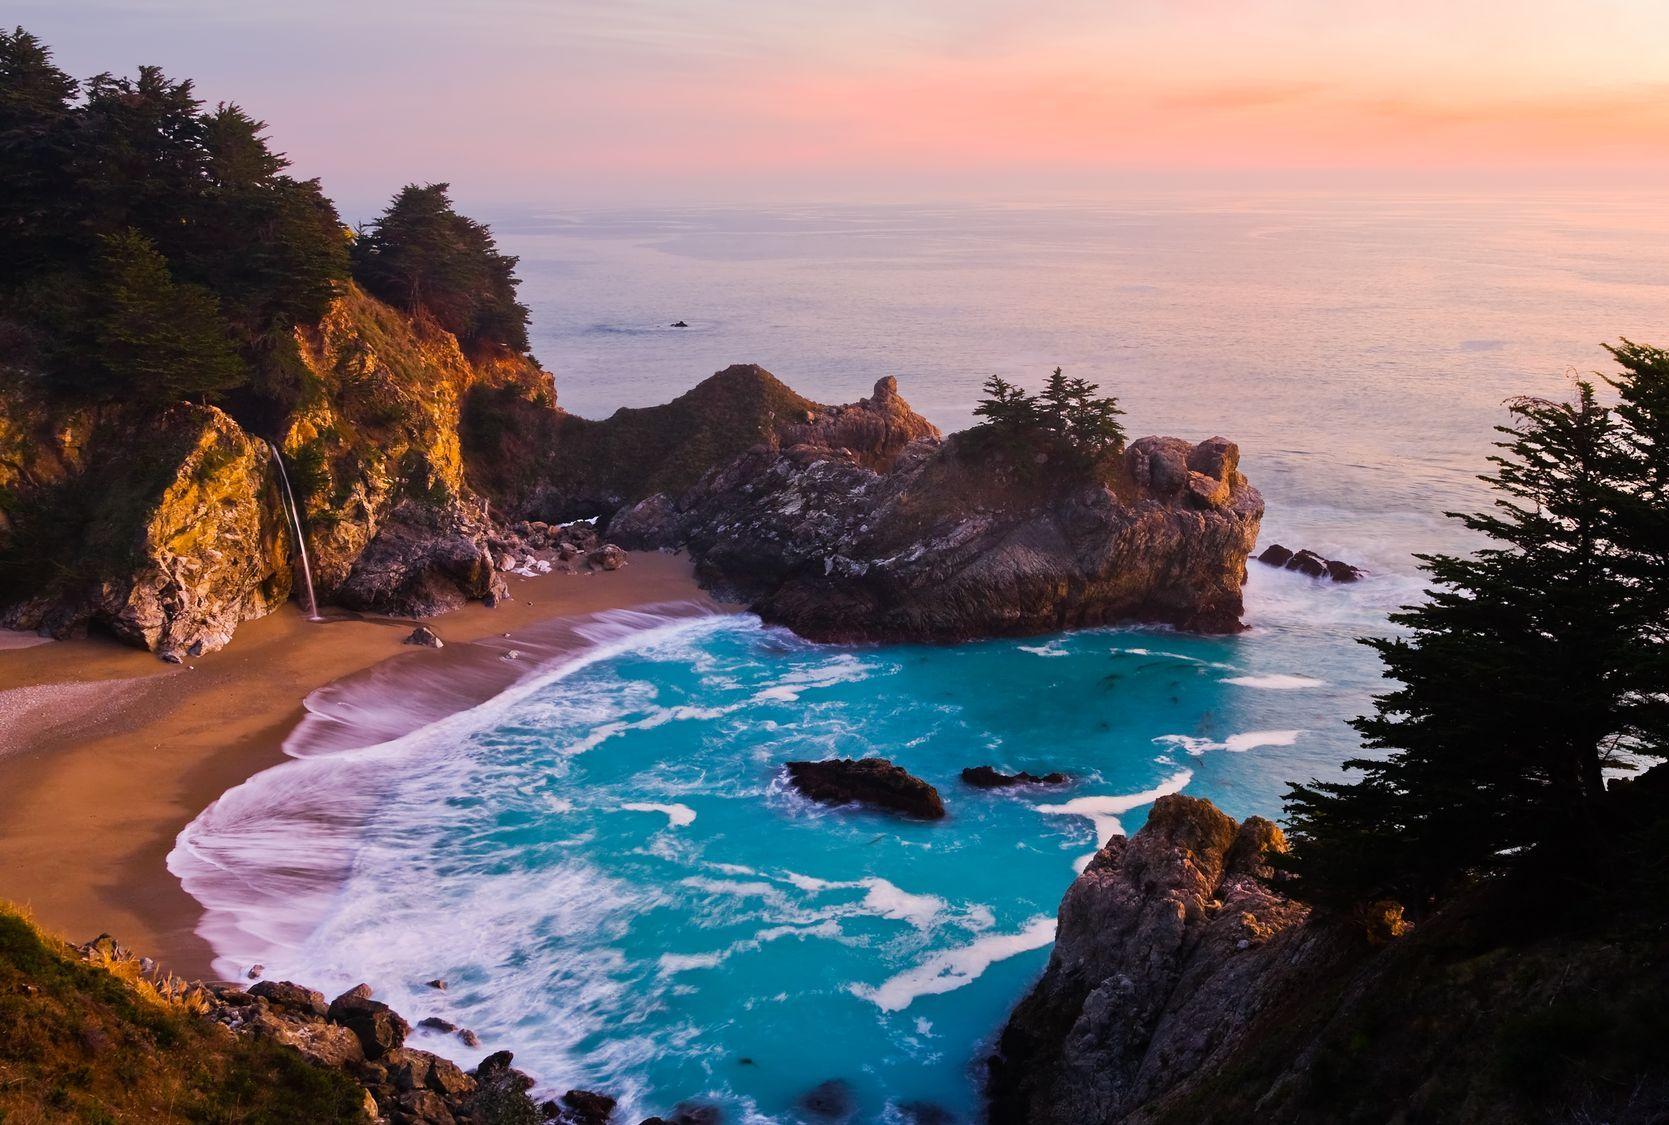 Road Tripping the California Coast